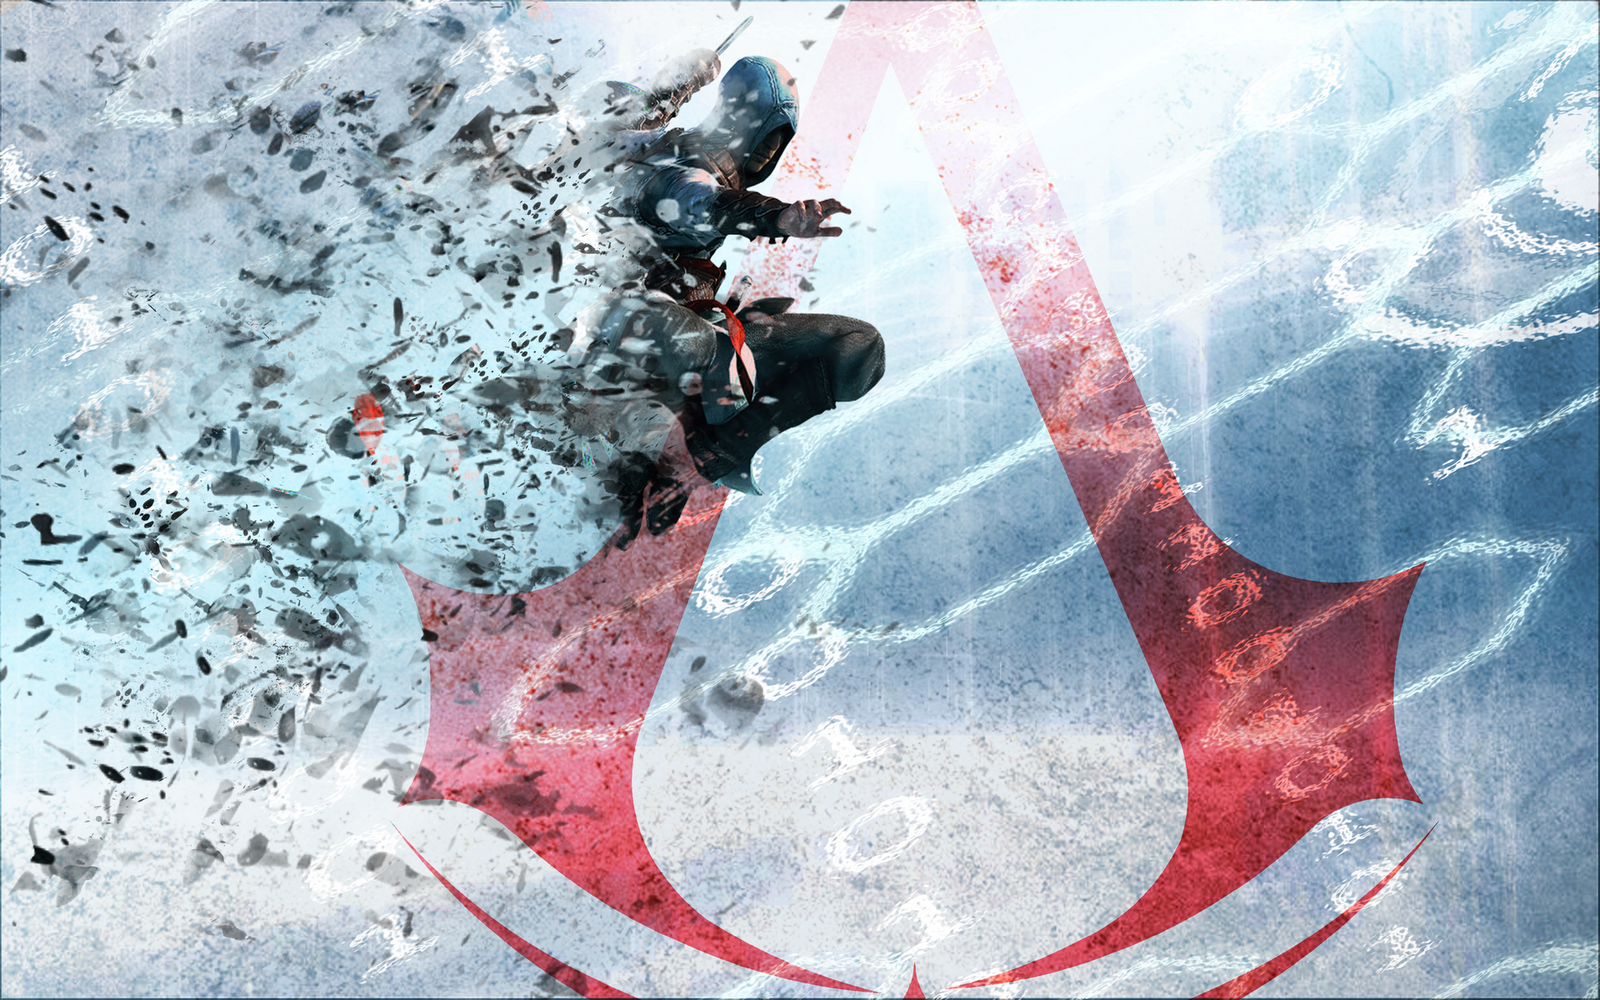 Assassin Creed HD Wallpaper 1080p   HD Dock 1600x1000